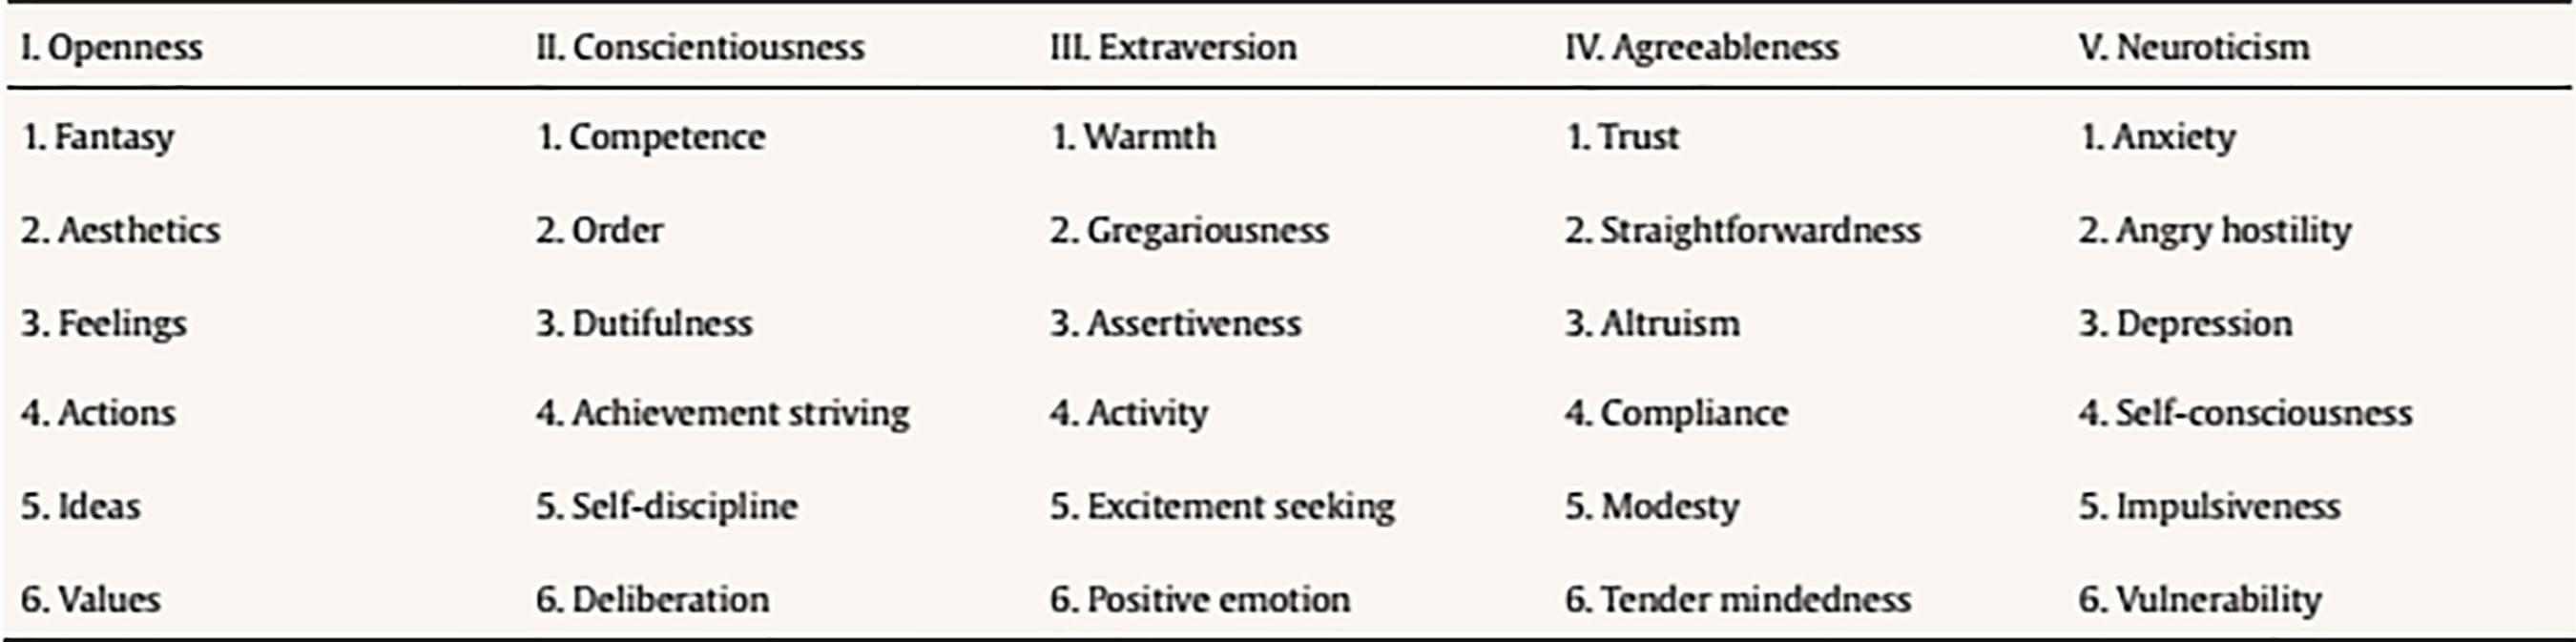 Big five extraversion facets